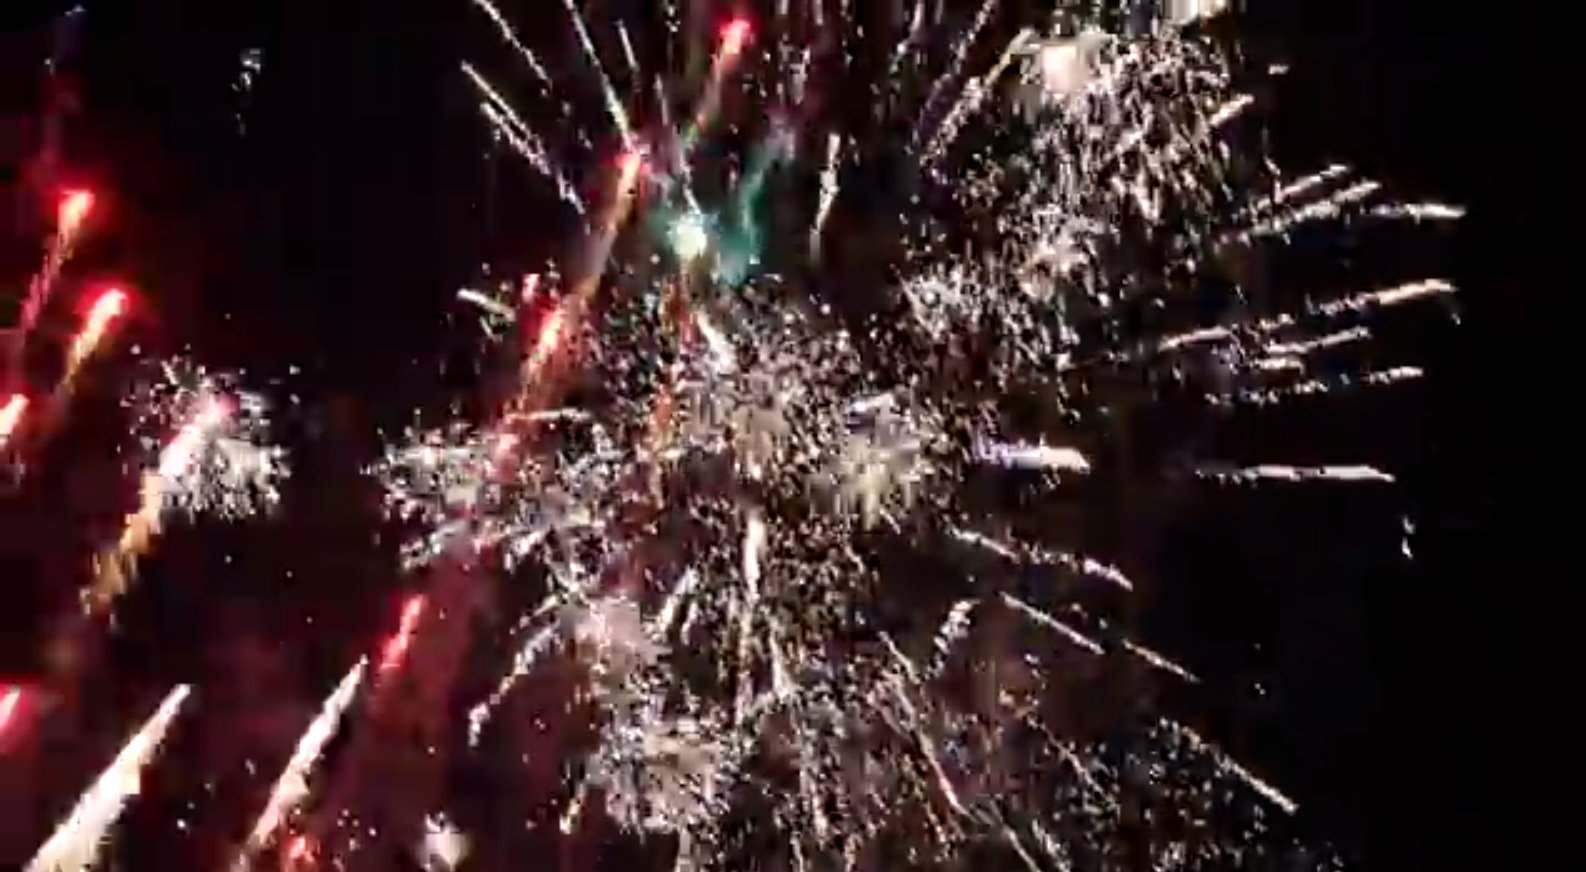 First Night in Austin Fireworks